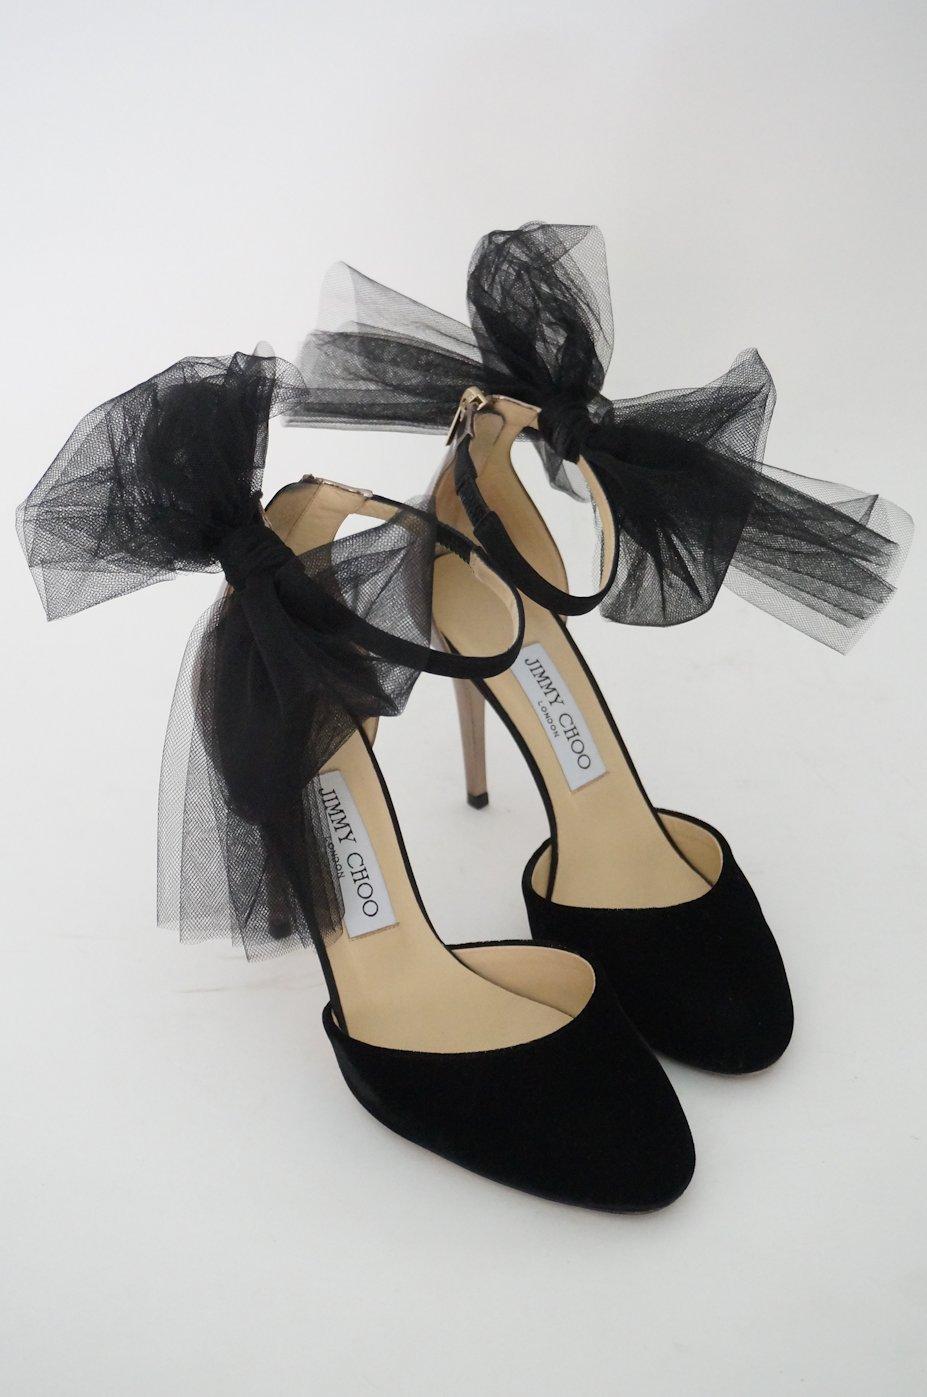 38e1620c49612 ジミーチュウ リボン付きストラップシューズ 37 1 2   レンタルリトルブラックドレス テン Rental Little Black Dress  ten.